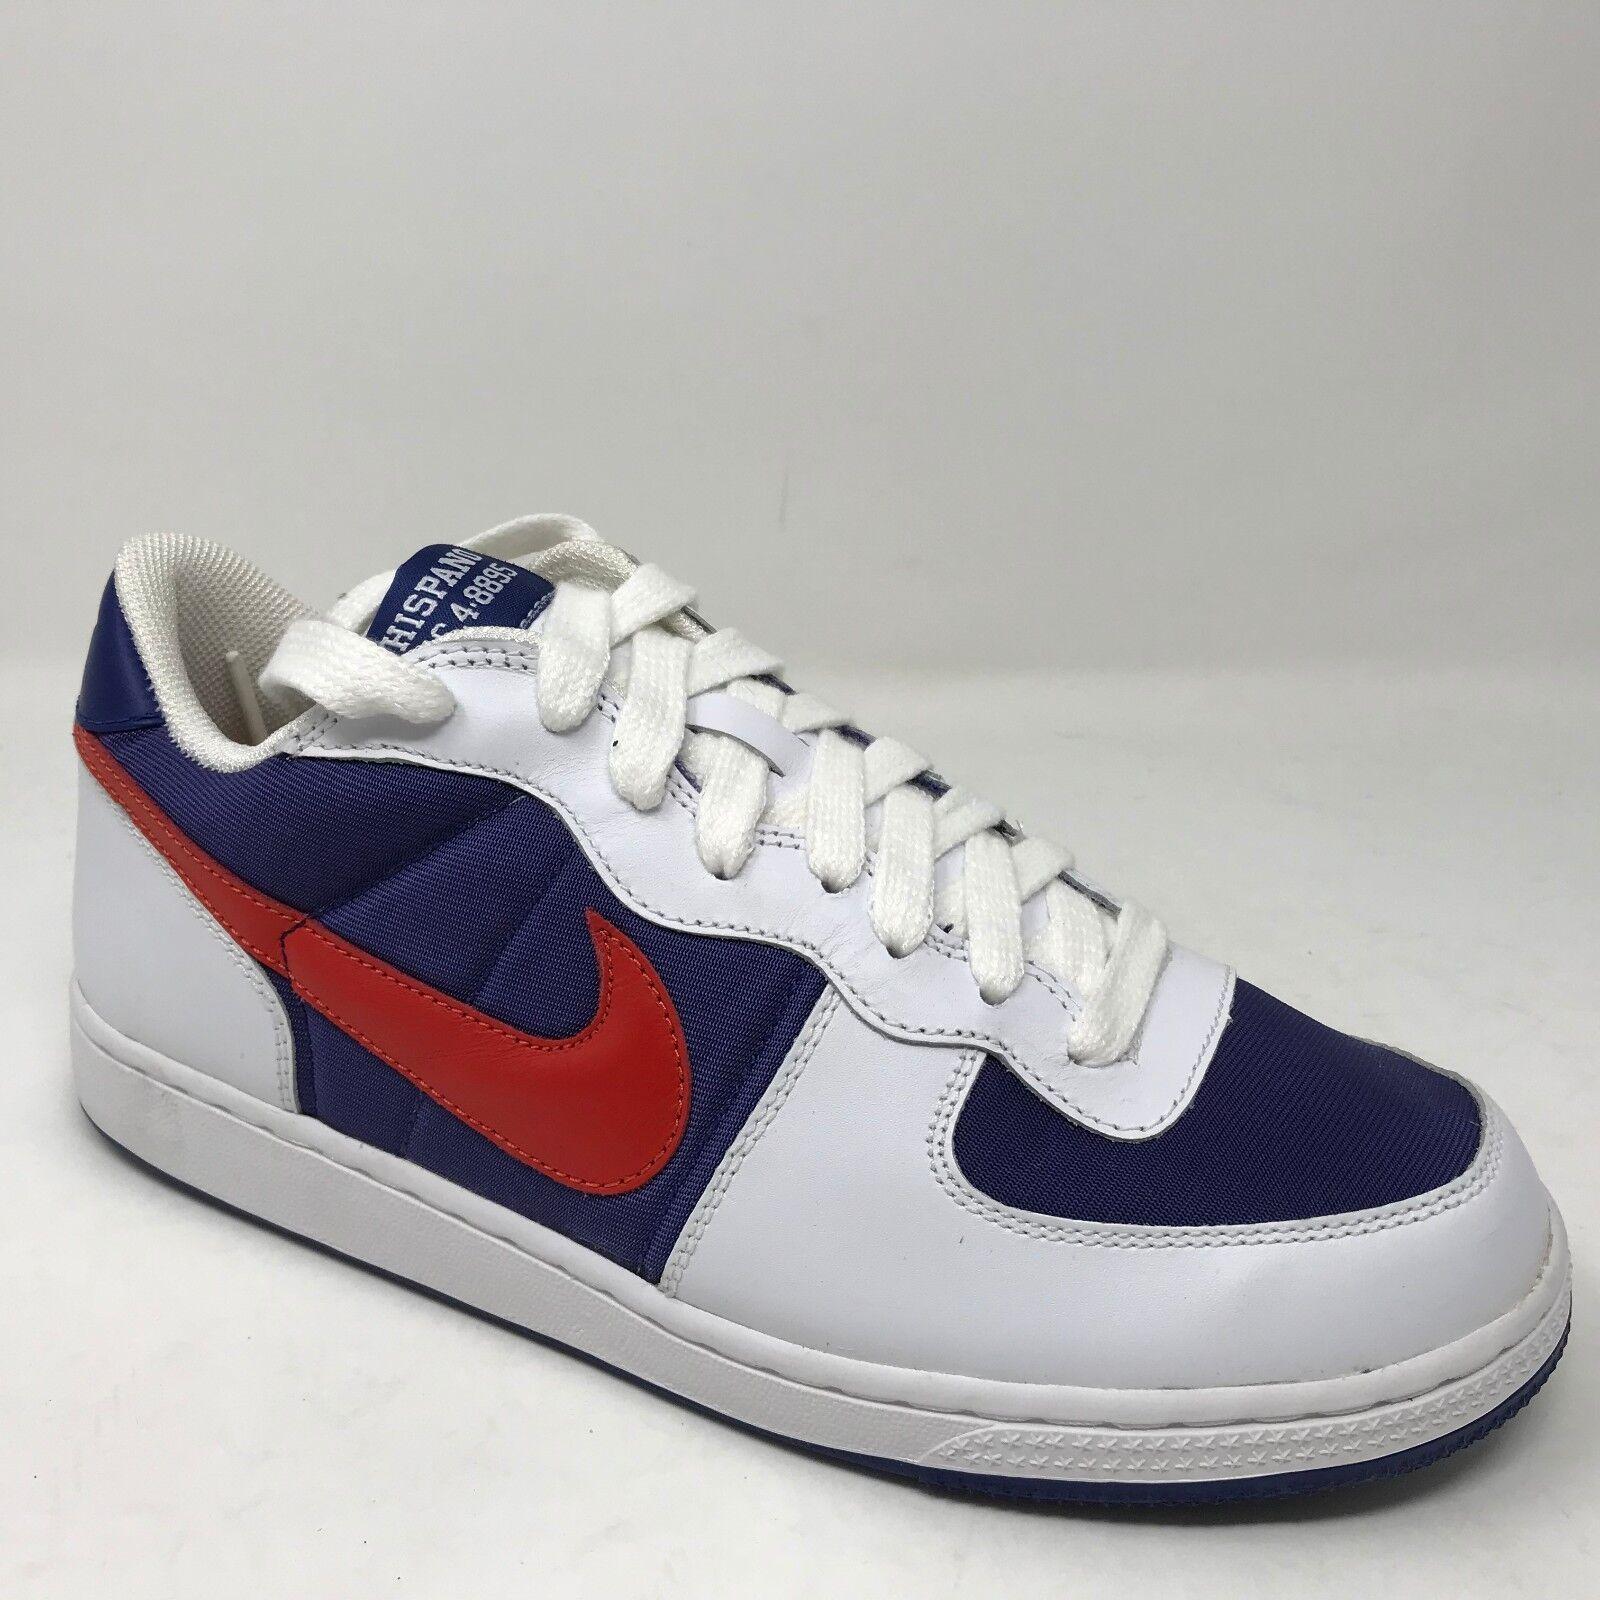 New Vintage Nike Zoom Terminator Low Brooklyn Hispano Football 310208-161 Size 8